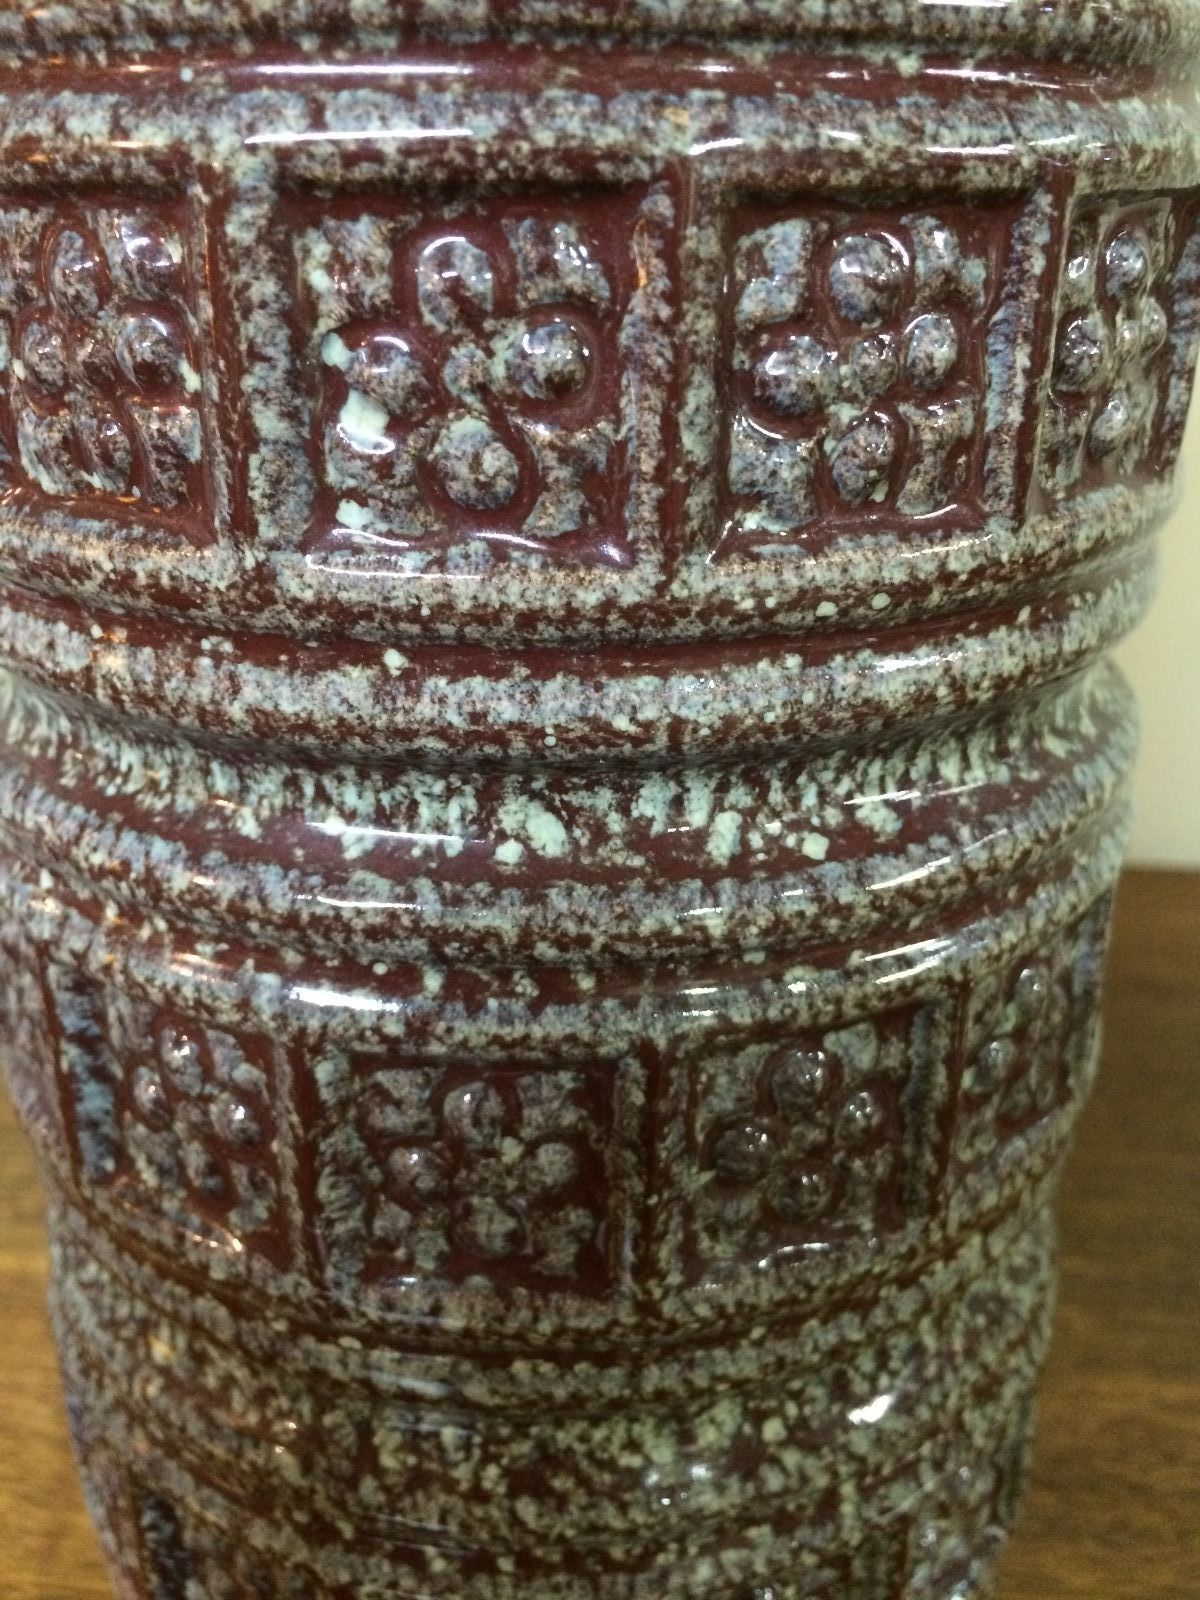 Vintage Retro Scheurich West German Pottery Vase | Melbourne | Halsey Road Recyclers